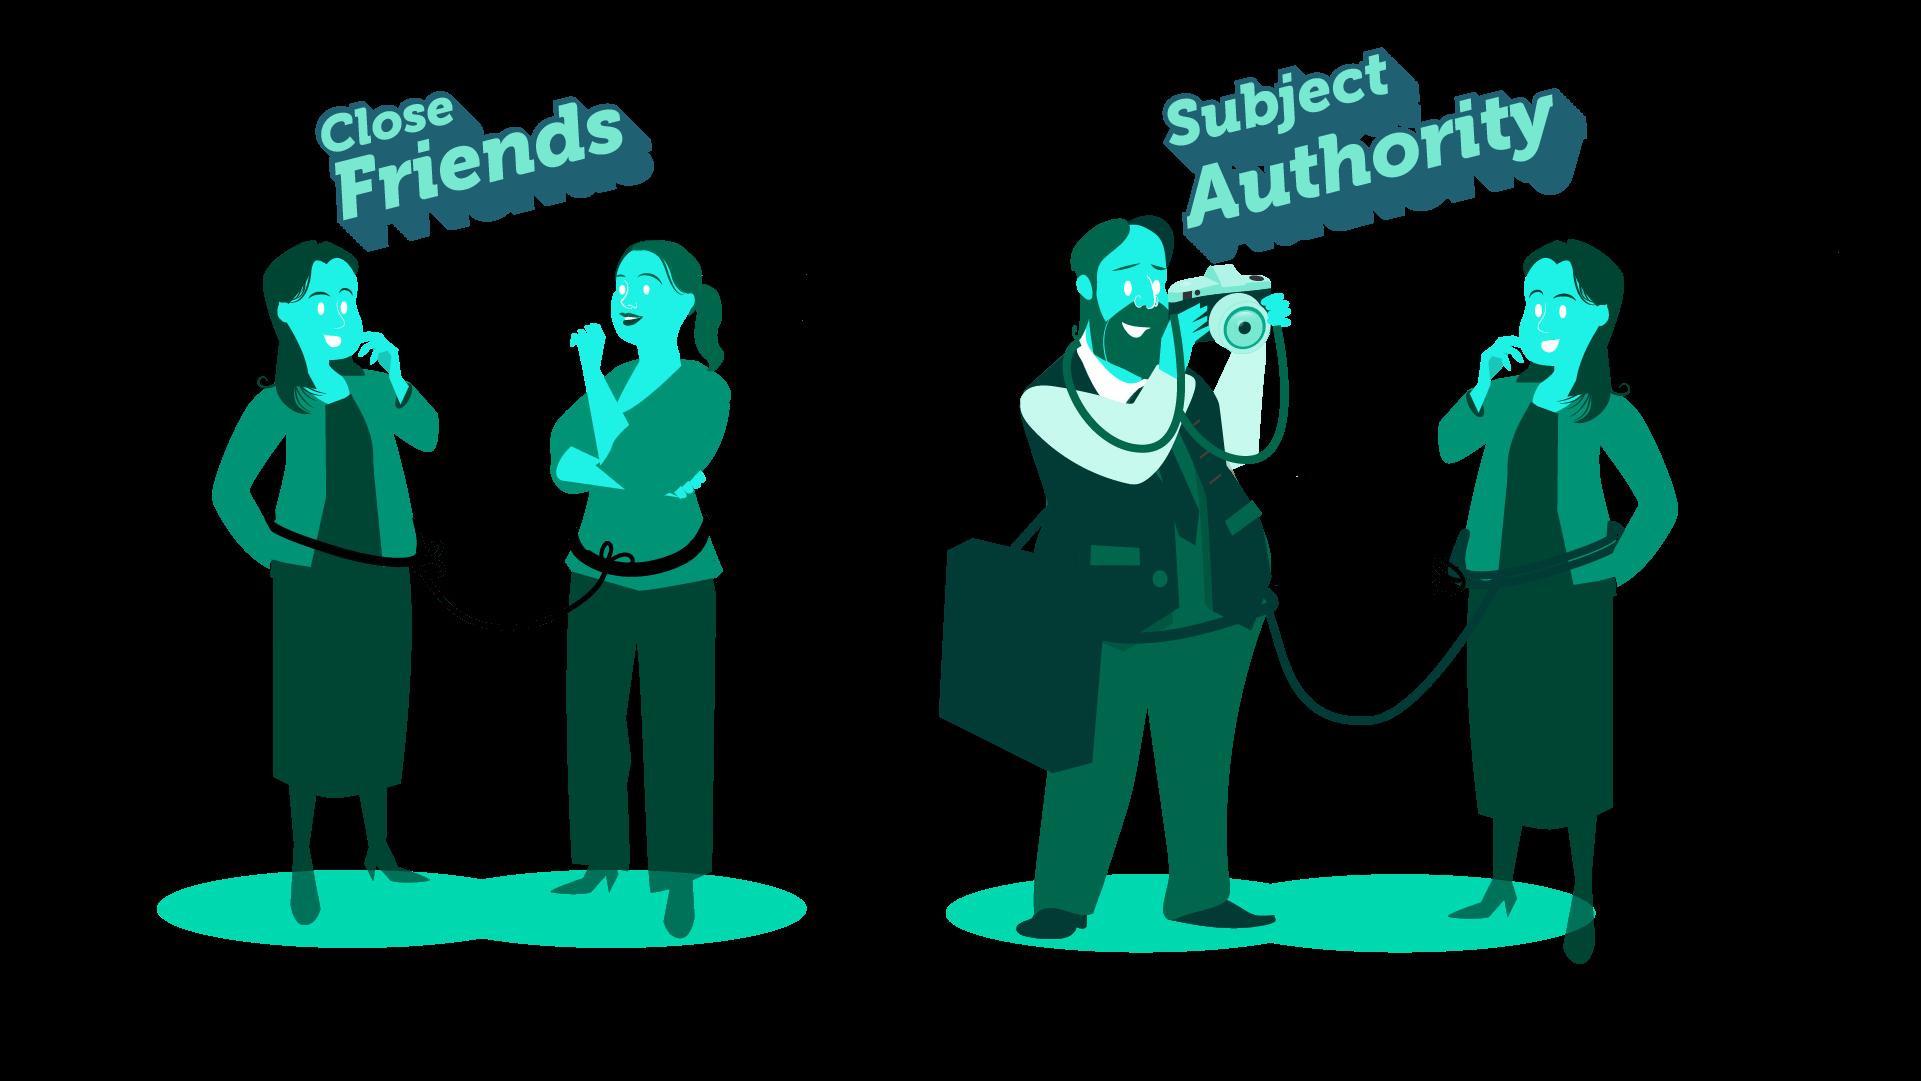 Close Friends vs Subject Authority